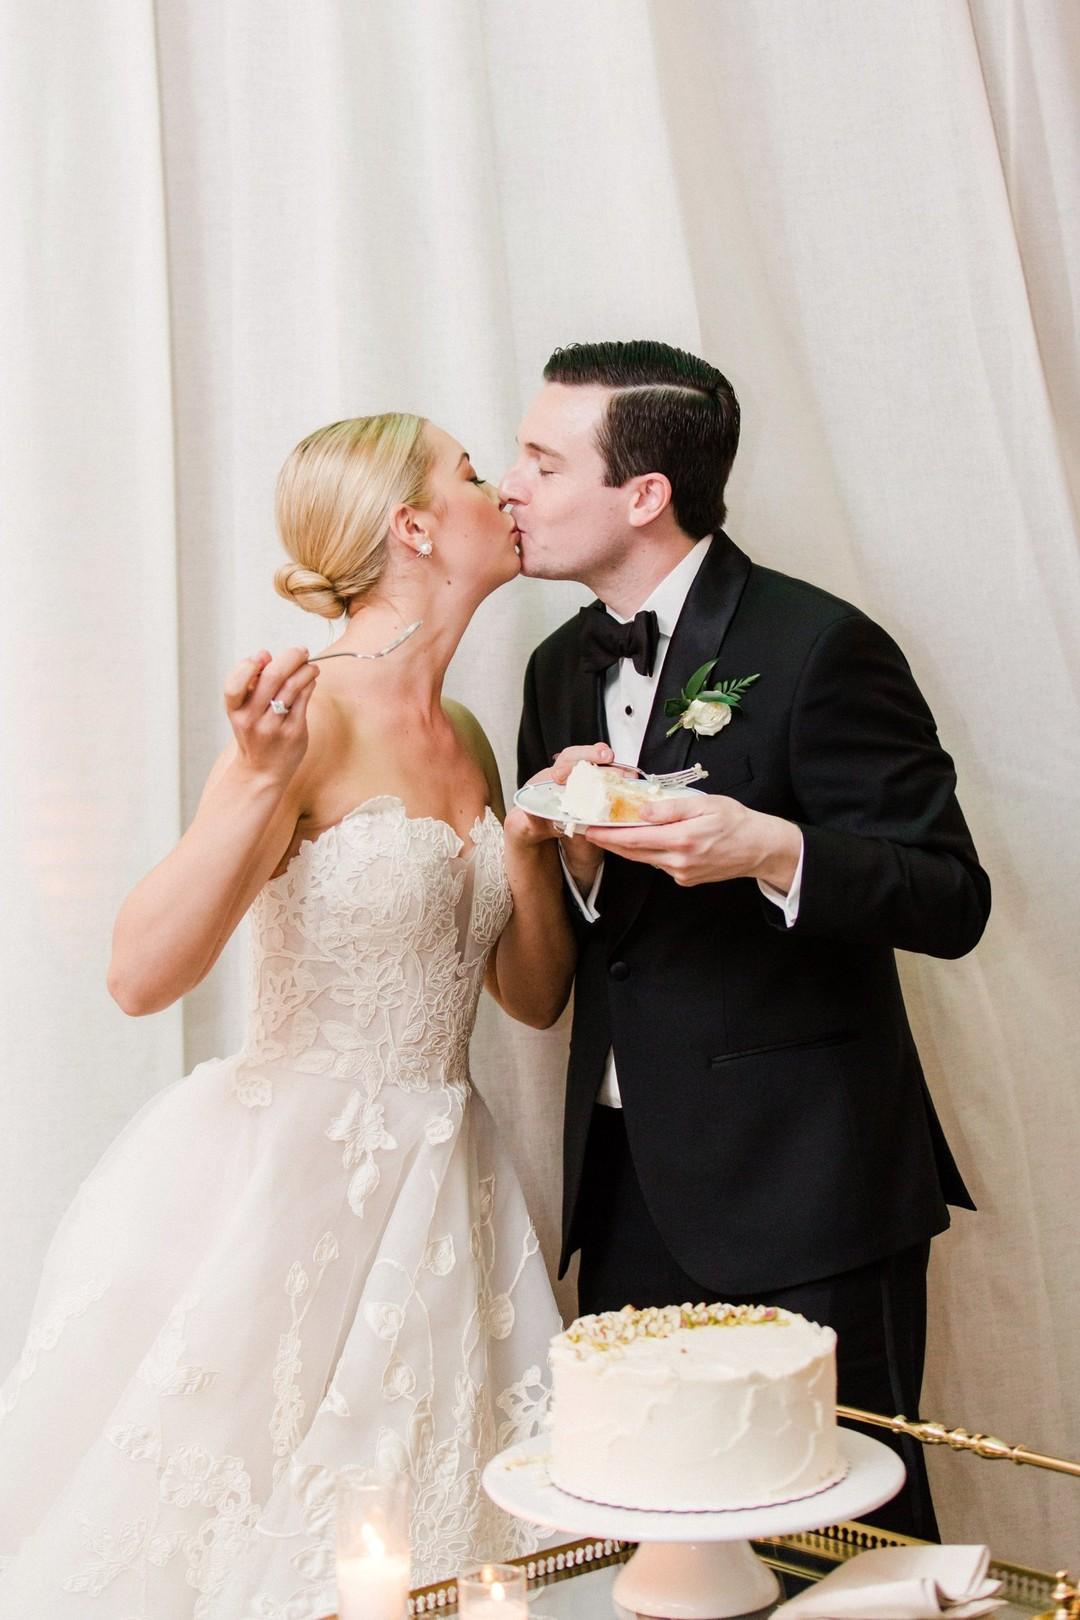 www.santabarbarawedding.com | Anna Delores | Vanessa Noel Events | Belmond El Encanto | Cake Cutting